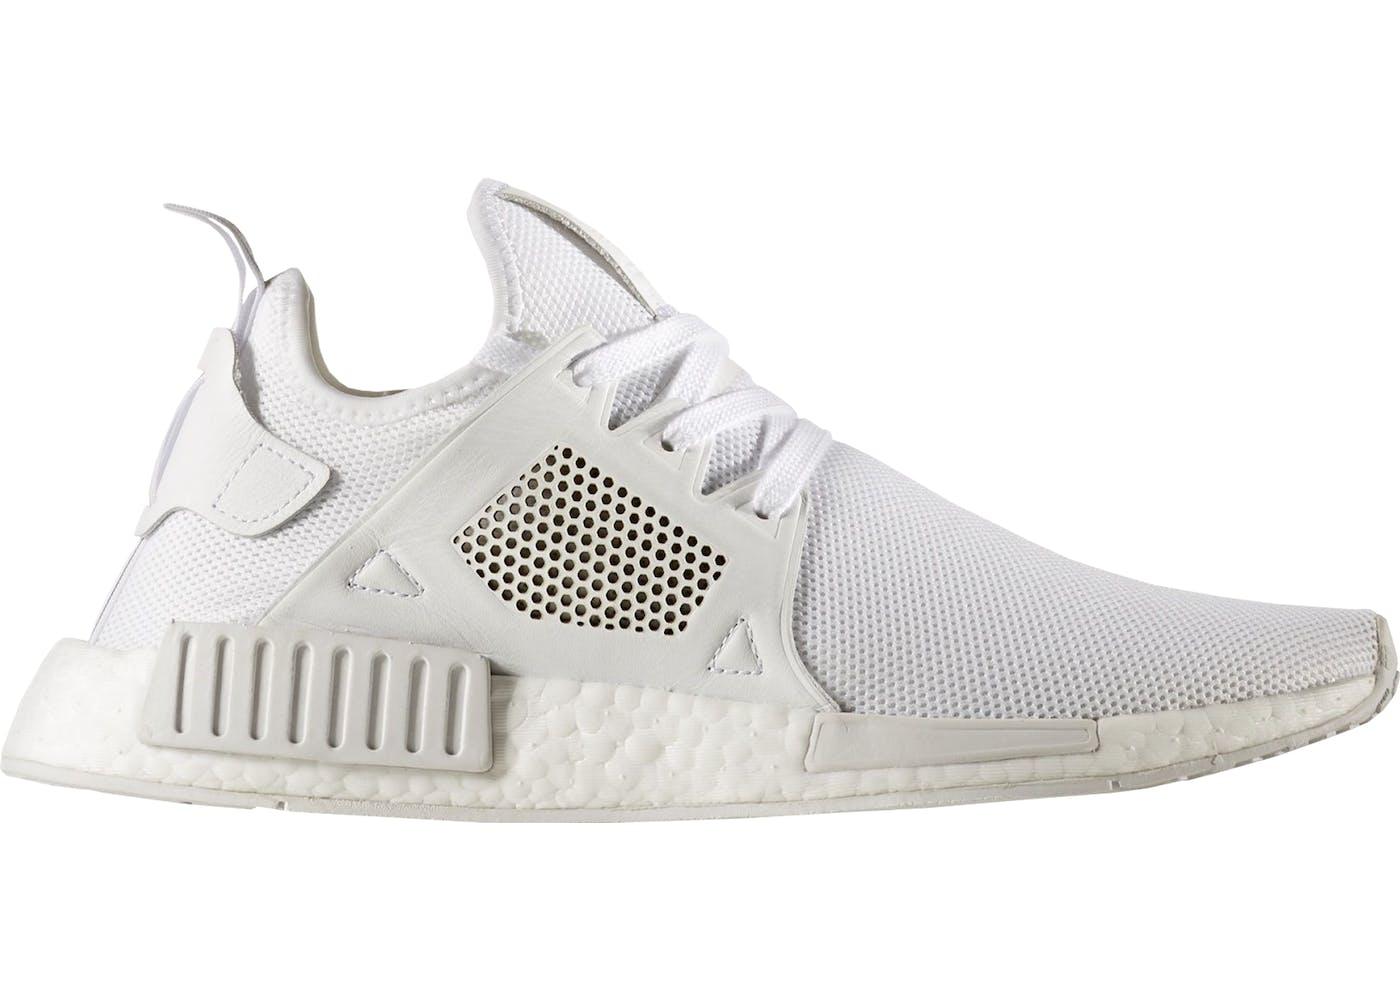 adidas xr1 triple white